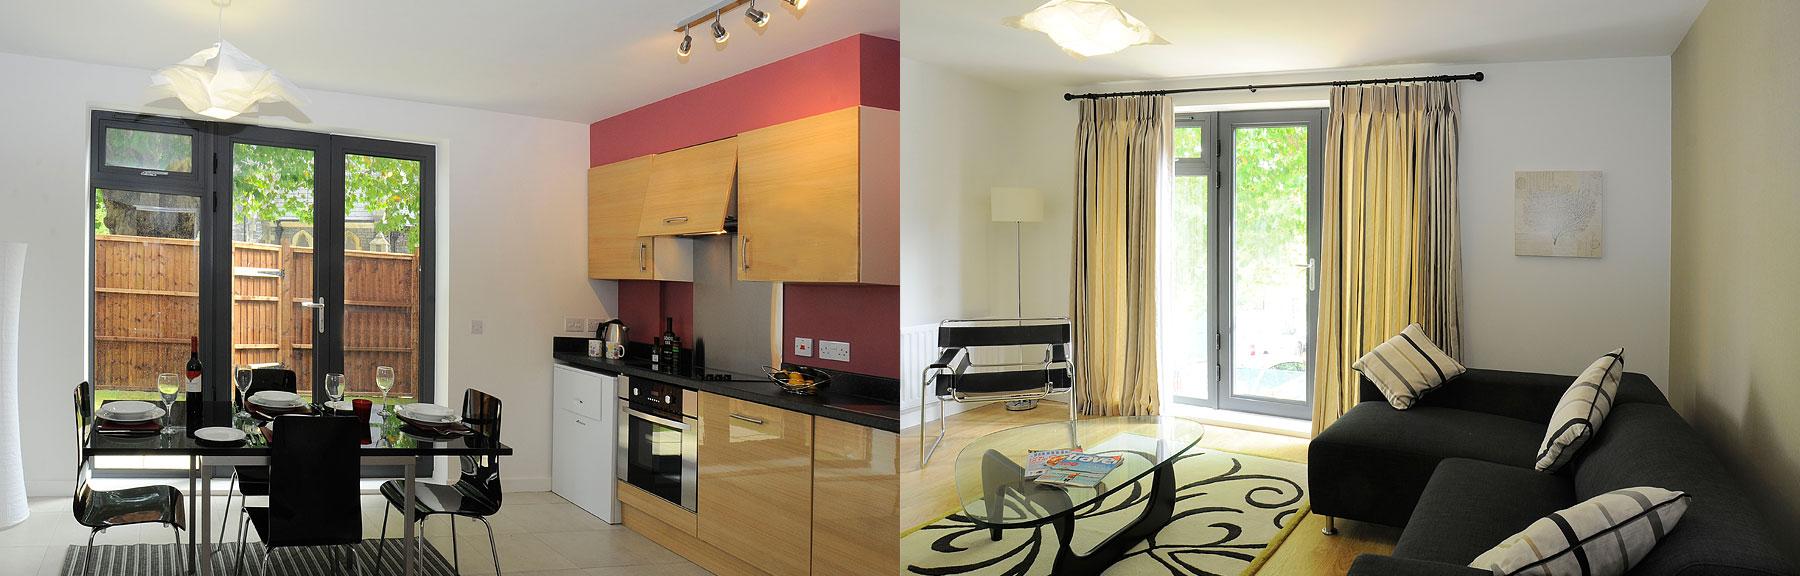 Saints Court Bristol Kitchen & Living Room